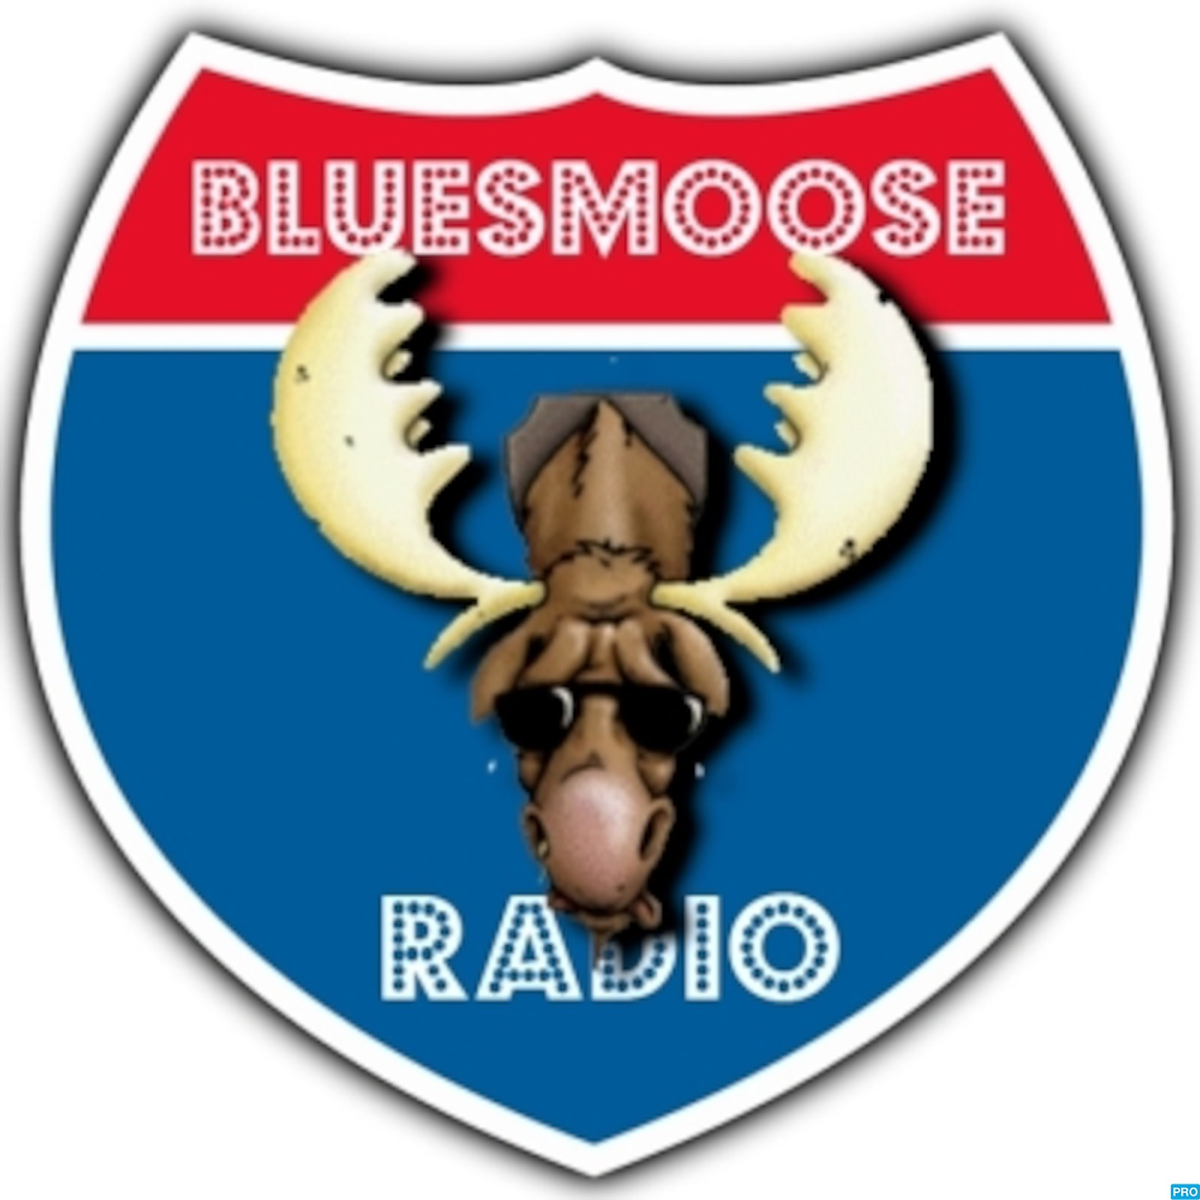 Best Episodes Of Blues Music Moose Radio On Podyssey Podcasts Andrew Smith Regular 5 Pockets Hitam 34